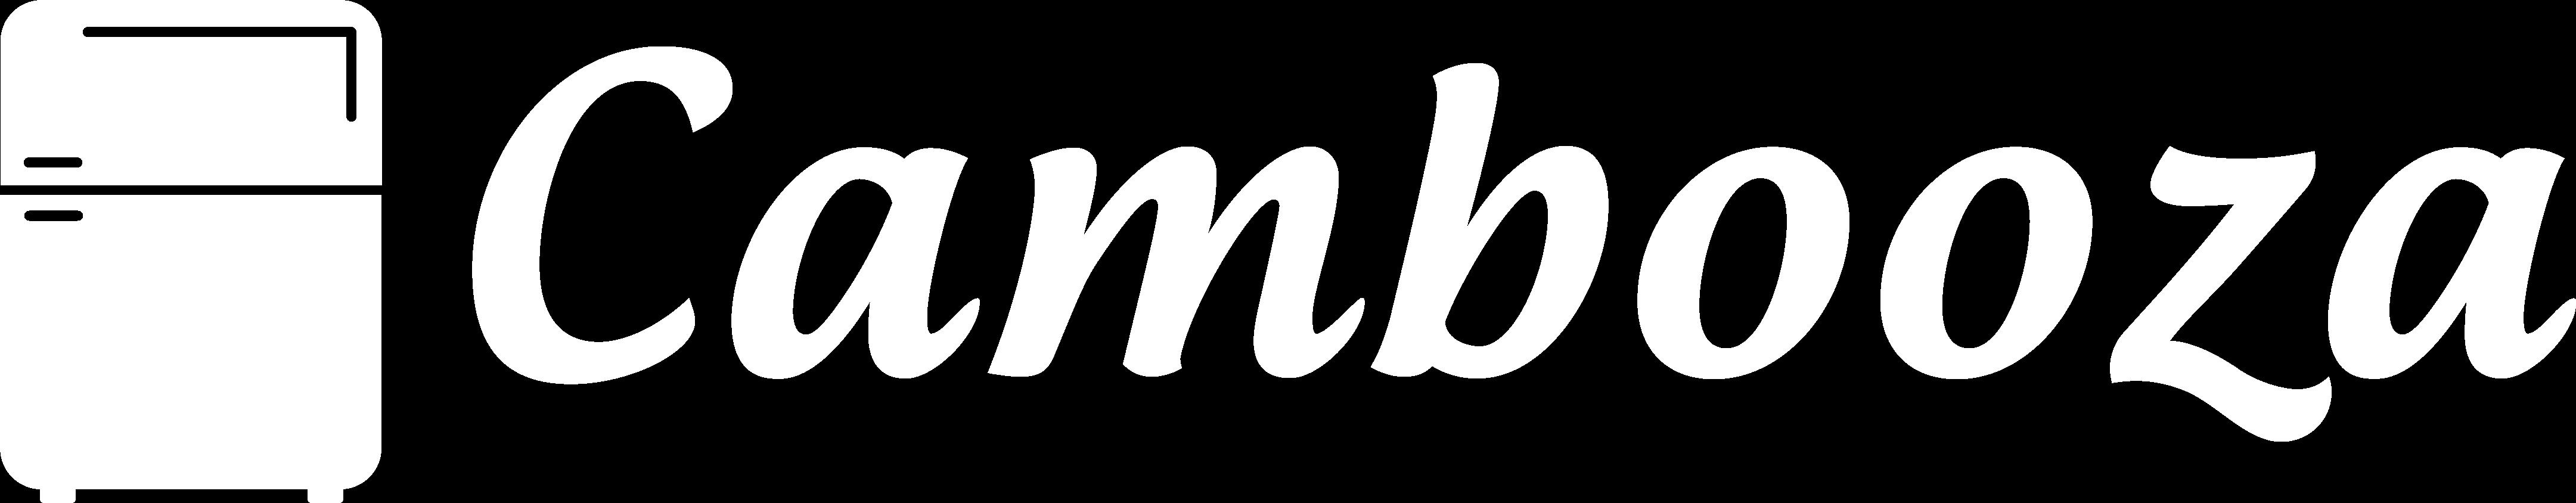 Cambooza